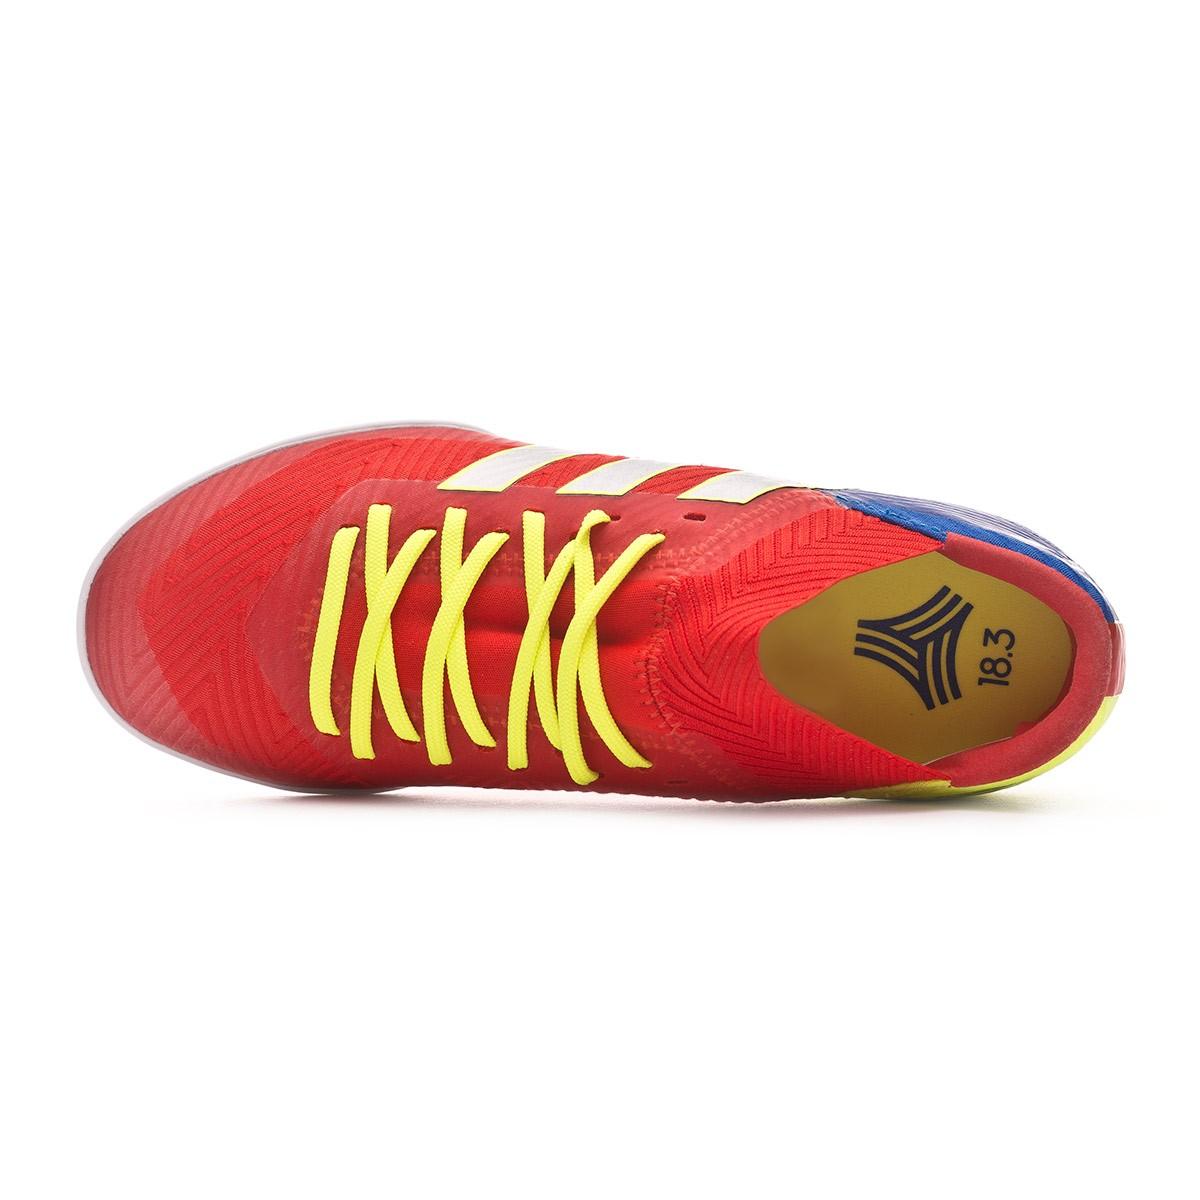 87687b773665c Tenis adidas Nemeziz Messi Tango 18.3 IN Niño Active red-Silver metallic-Football  blue - Tienda de fútbol Fútbol Emotion